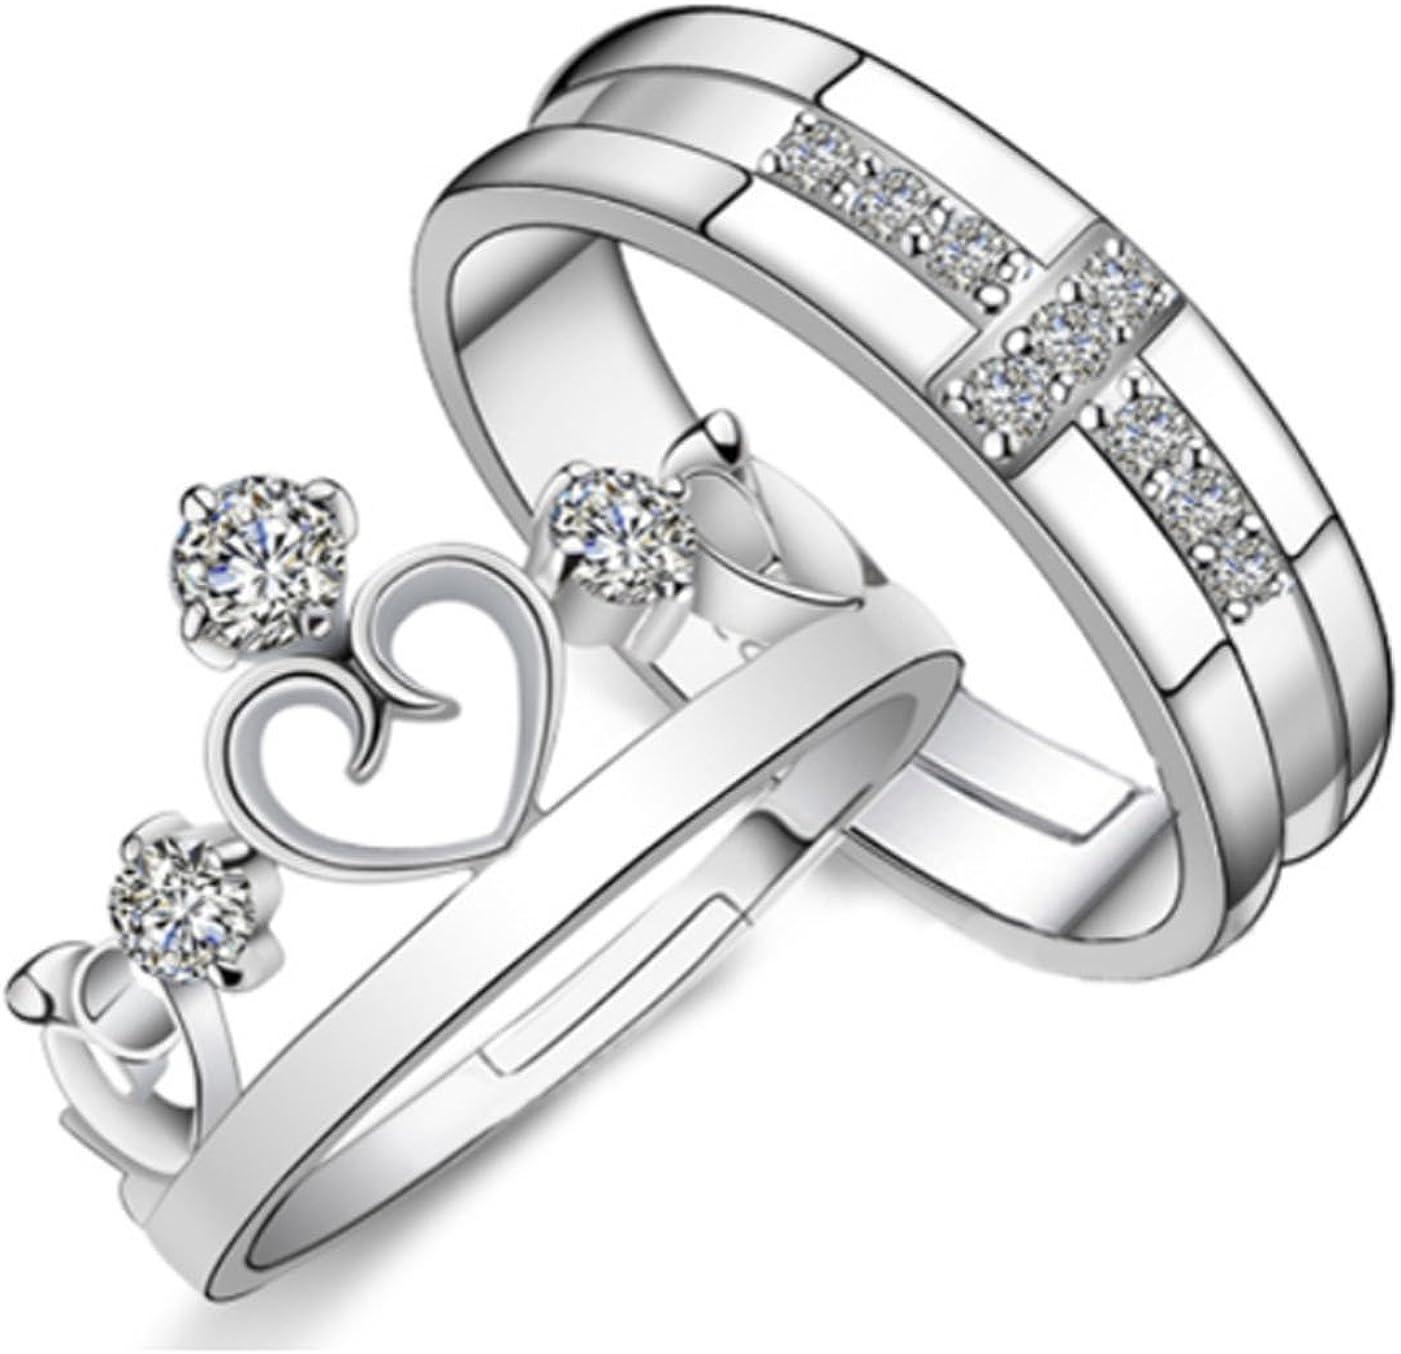 Karatcart Women's Platinum Plated セール開催中最短即日発送 Elegant Couple King And ランキング総合1位 Queen